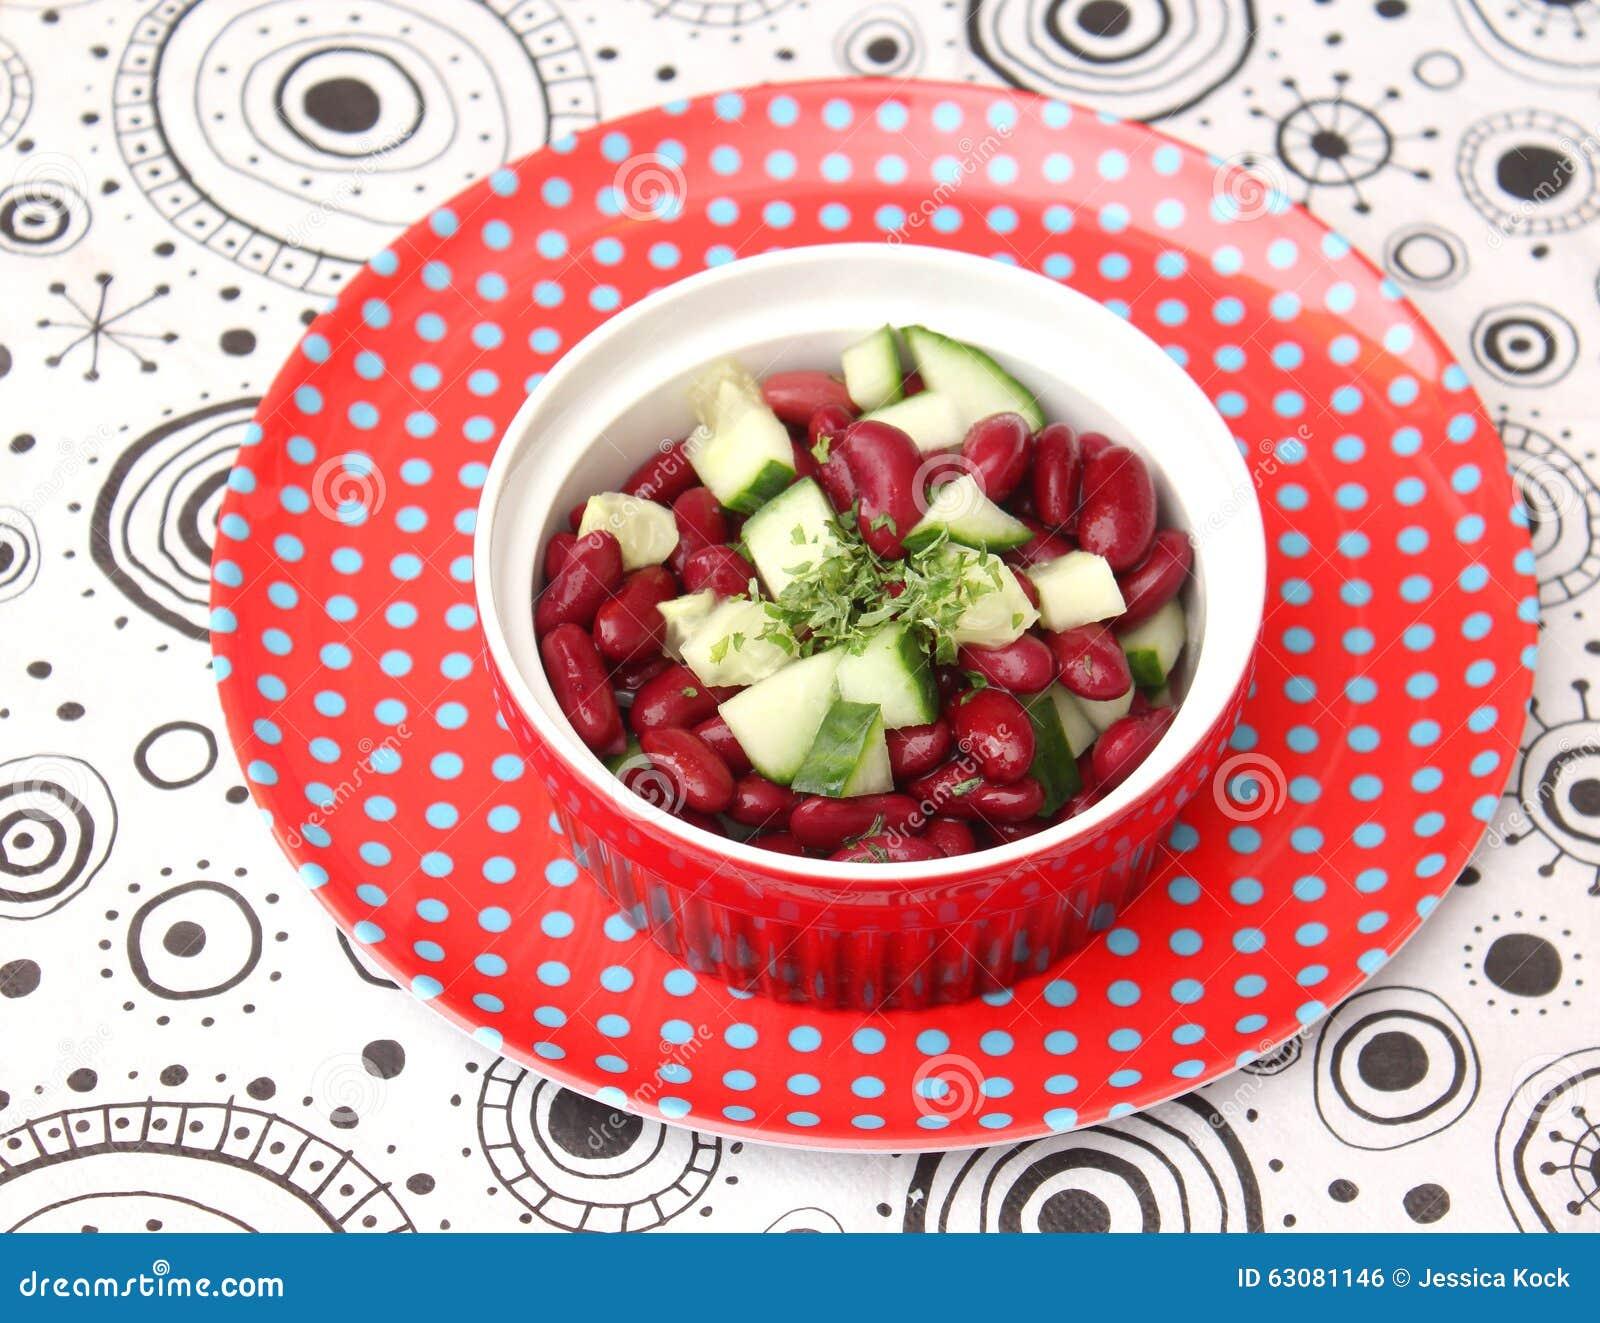 Download Salade des haricots photo stock. Image du secouez, oeuvres - 63081146